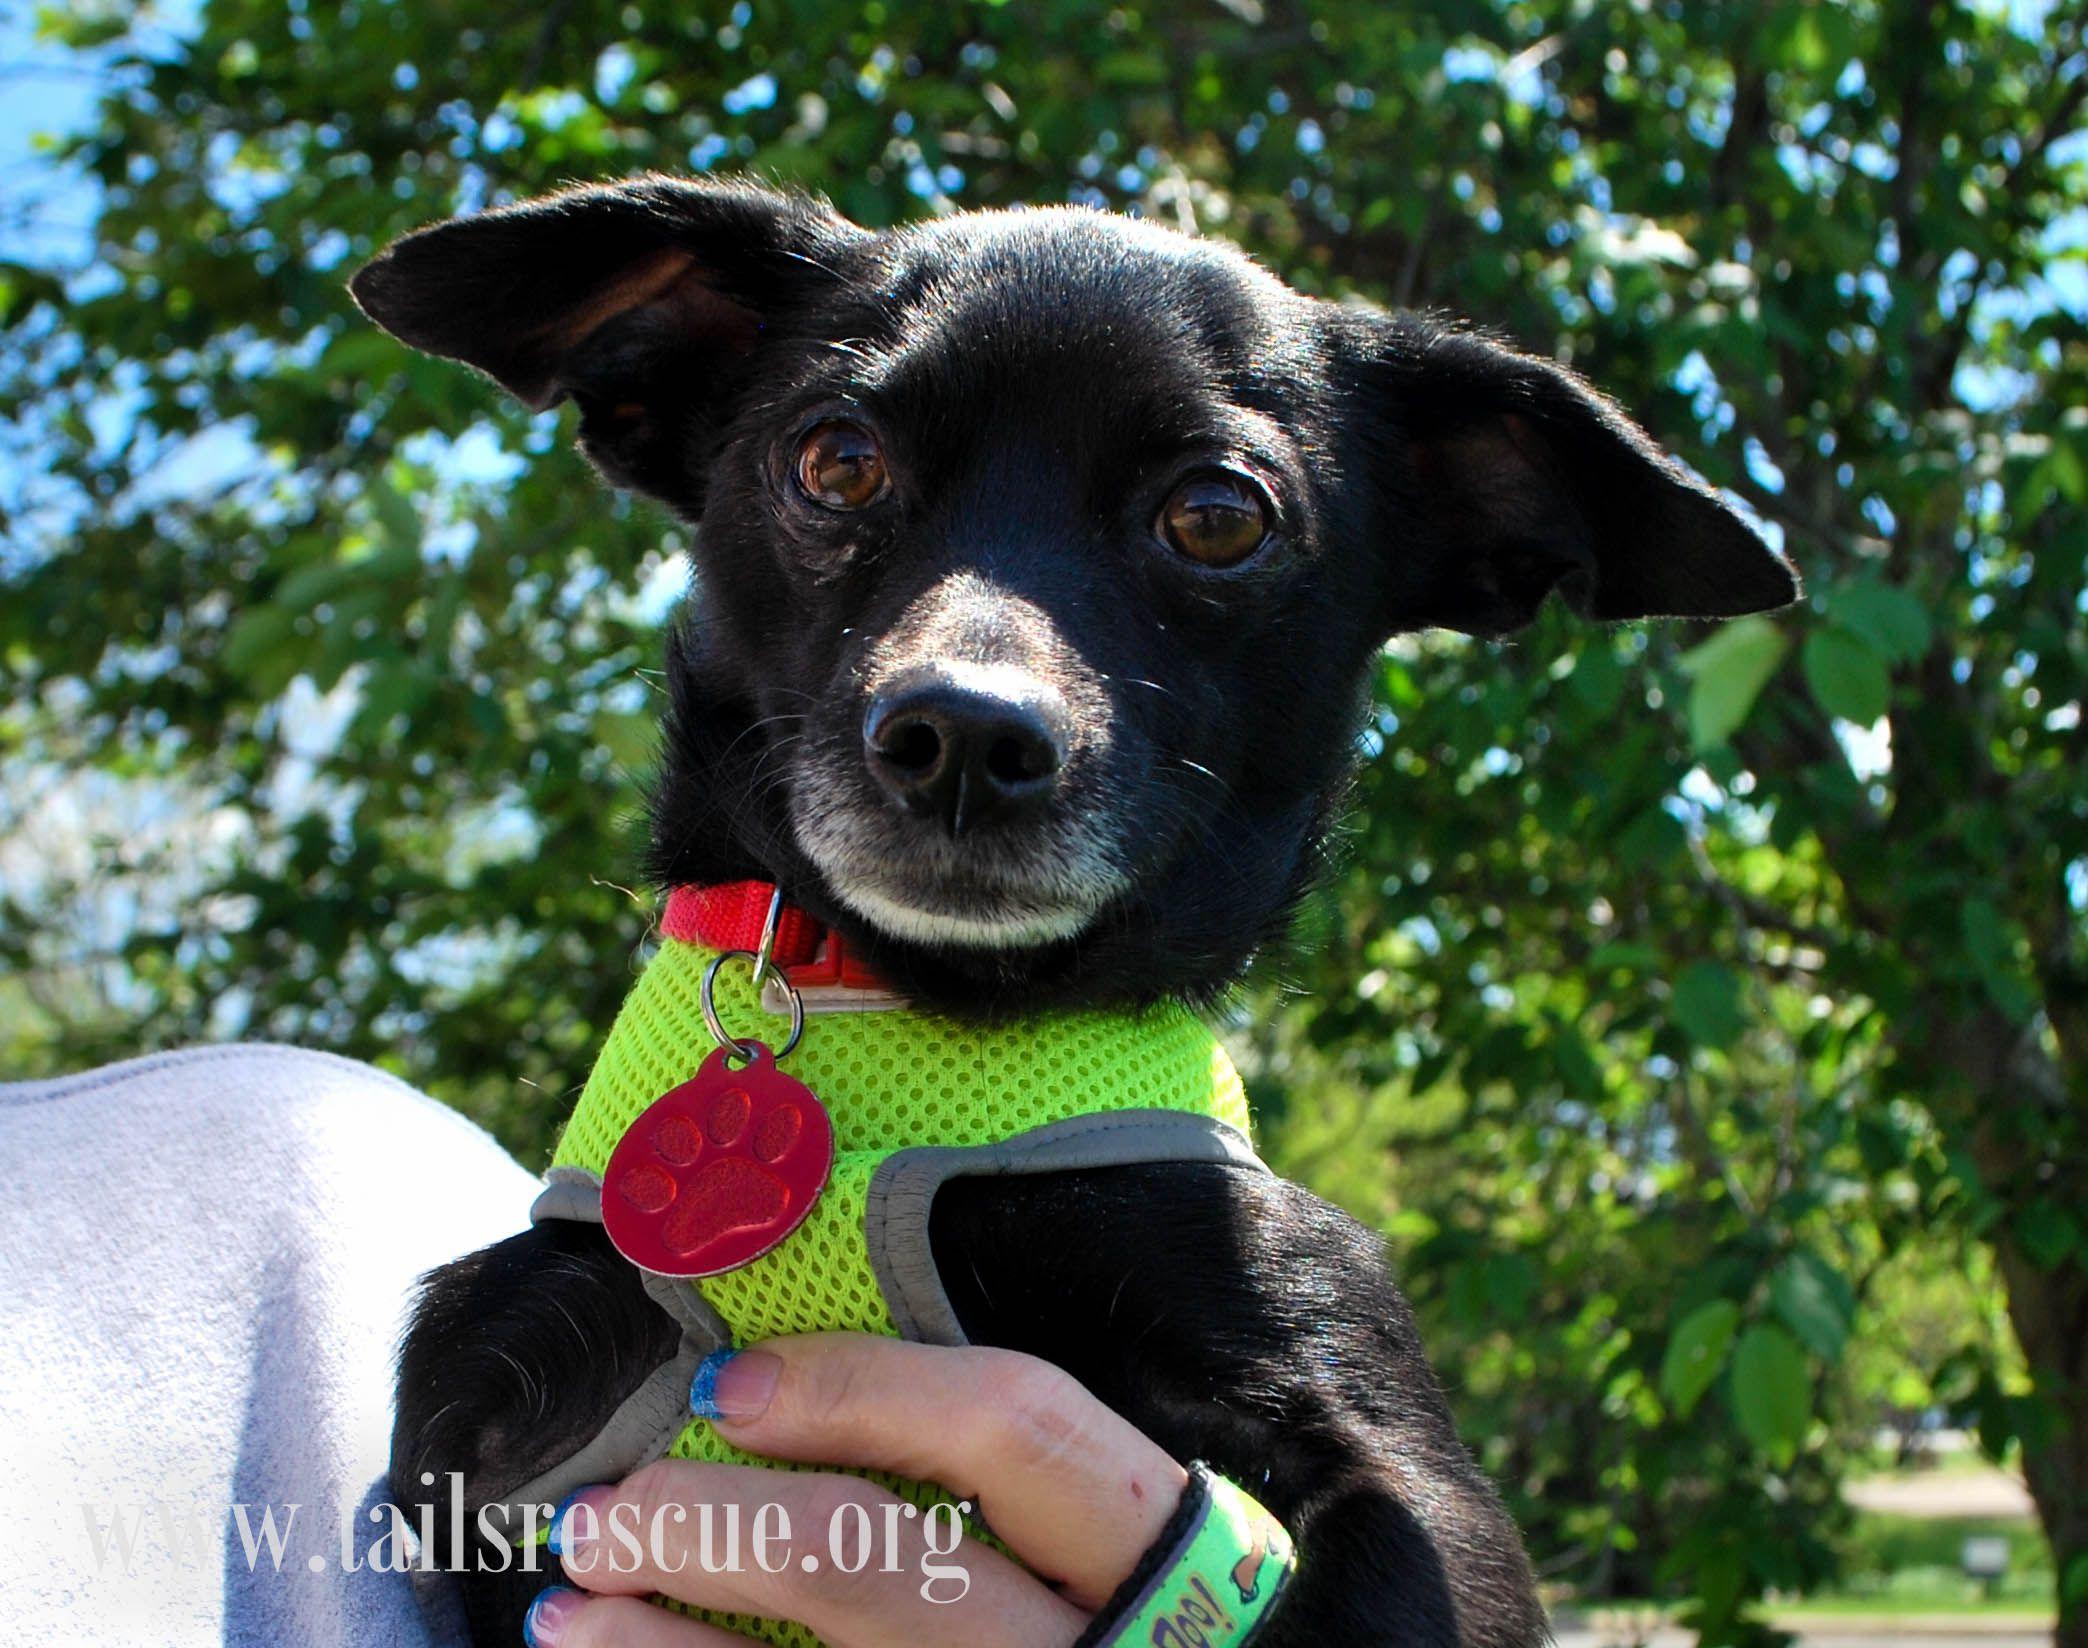 Italian Greyhuahua dog for Adoption in Maple Grove, MN